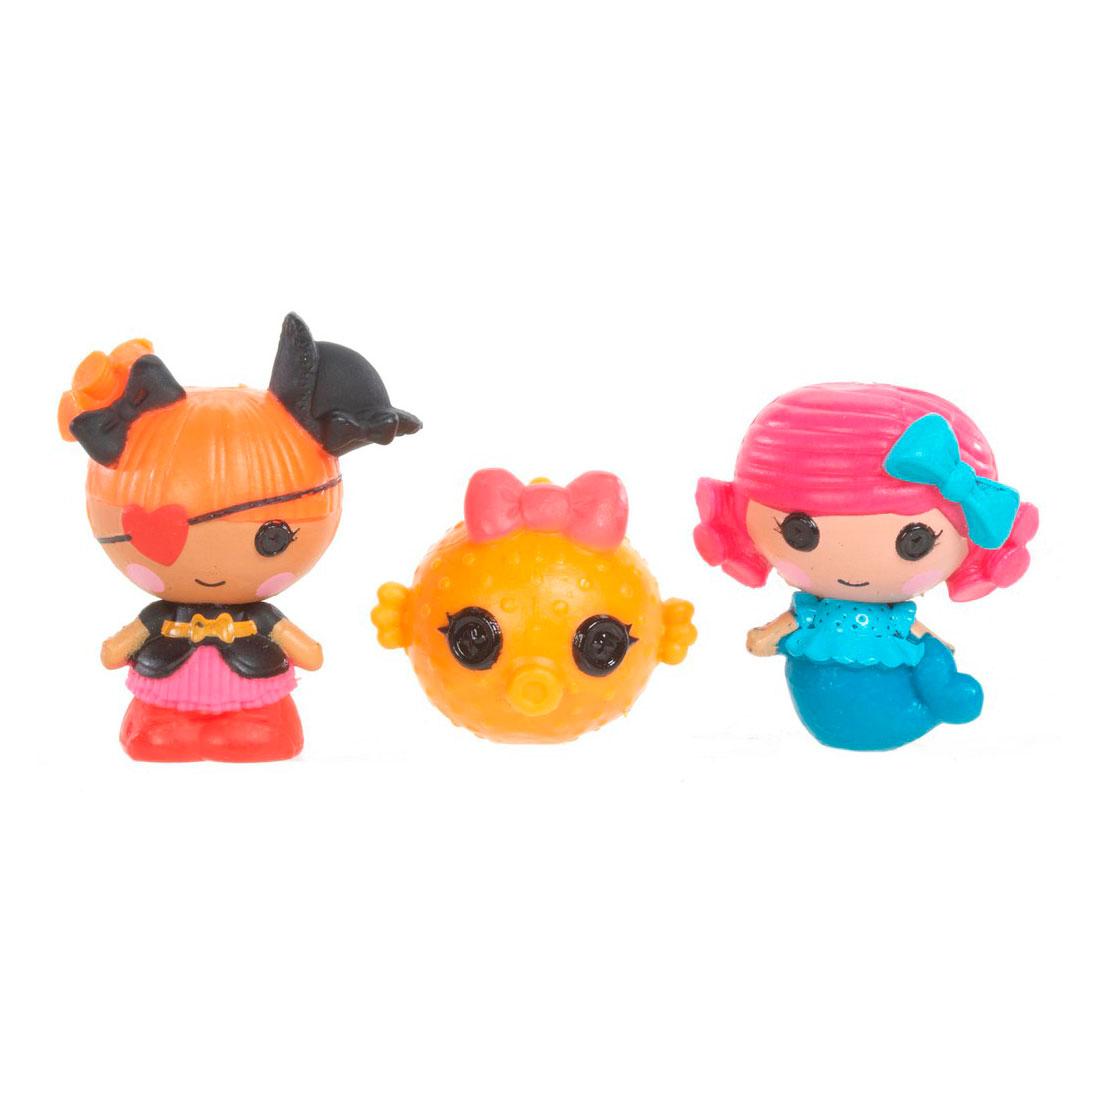 Кукла Mini Lalaloopsy Русалочка, Пират, Рыбка